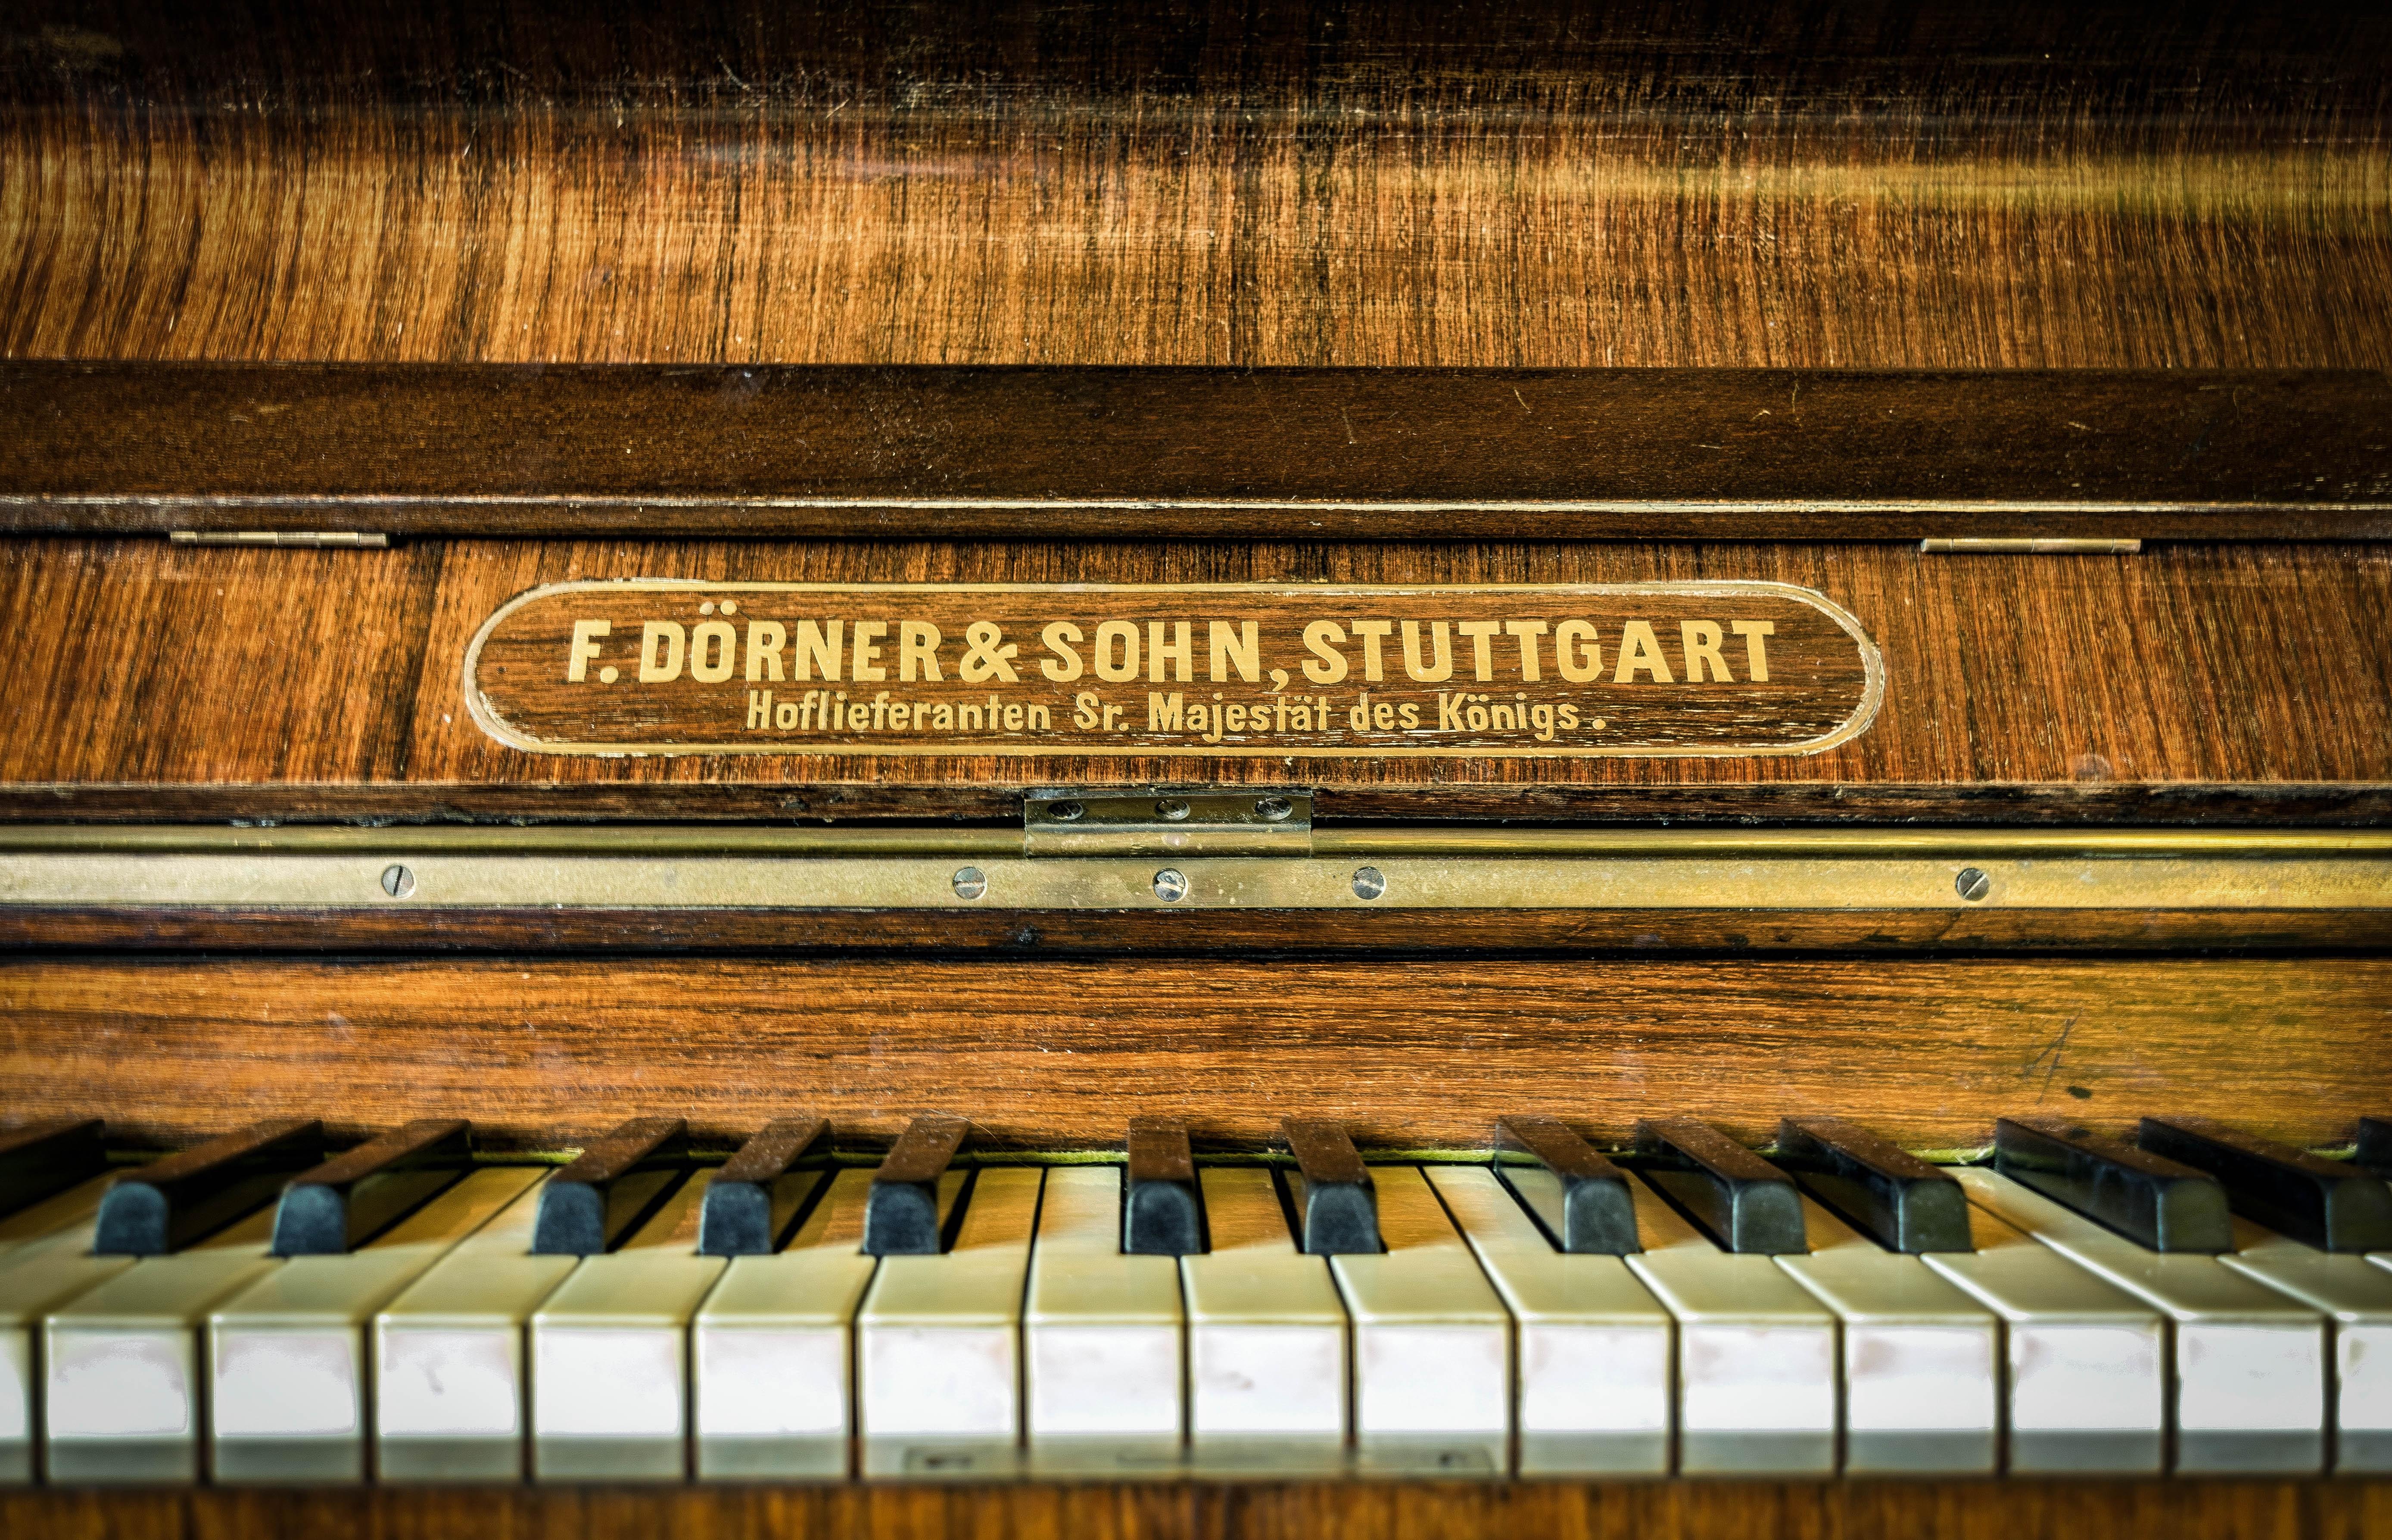 Gambar Sayap Keyboard Teknologi Putih Antik Tua Hitam Alat Musik Raja Kunci Kunci Suara Stuttgart Bermain Piano Tuts Piano Musik Klasik Pemasok D Rner Instrumen String Spinet Semacam Alat Musik Peralatan Elektronik